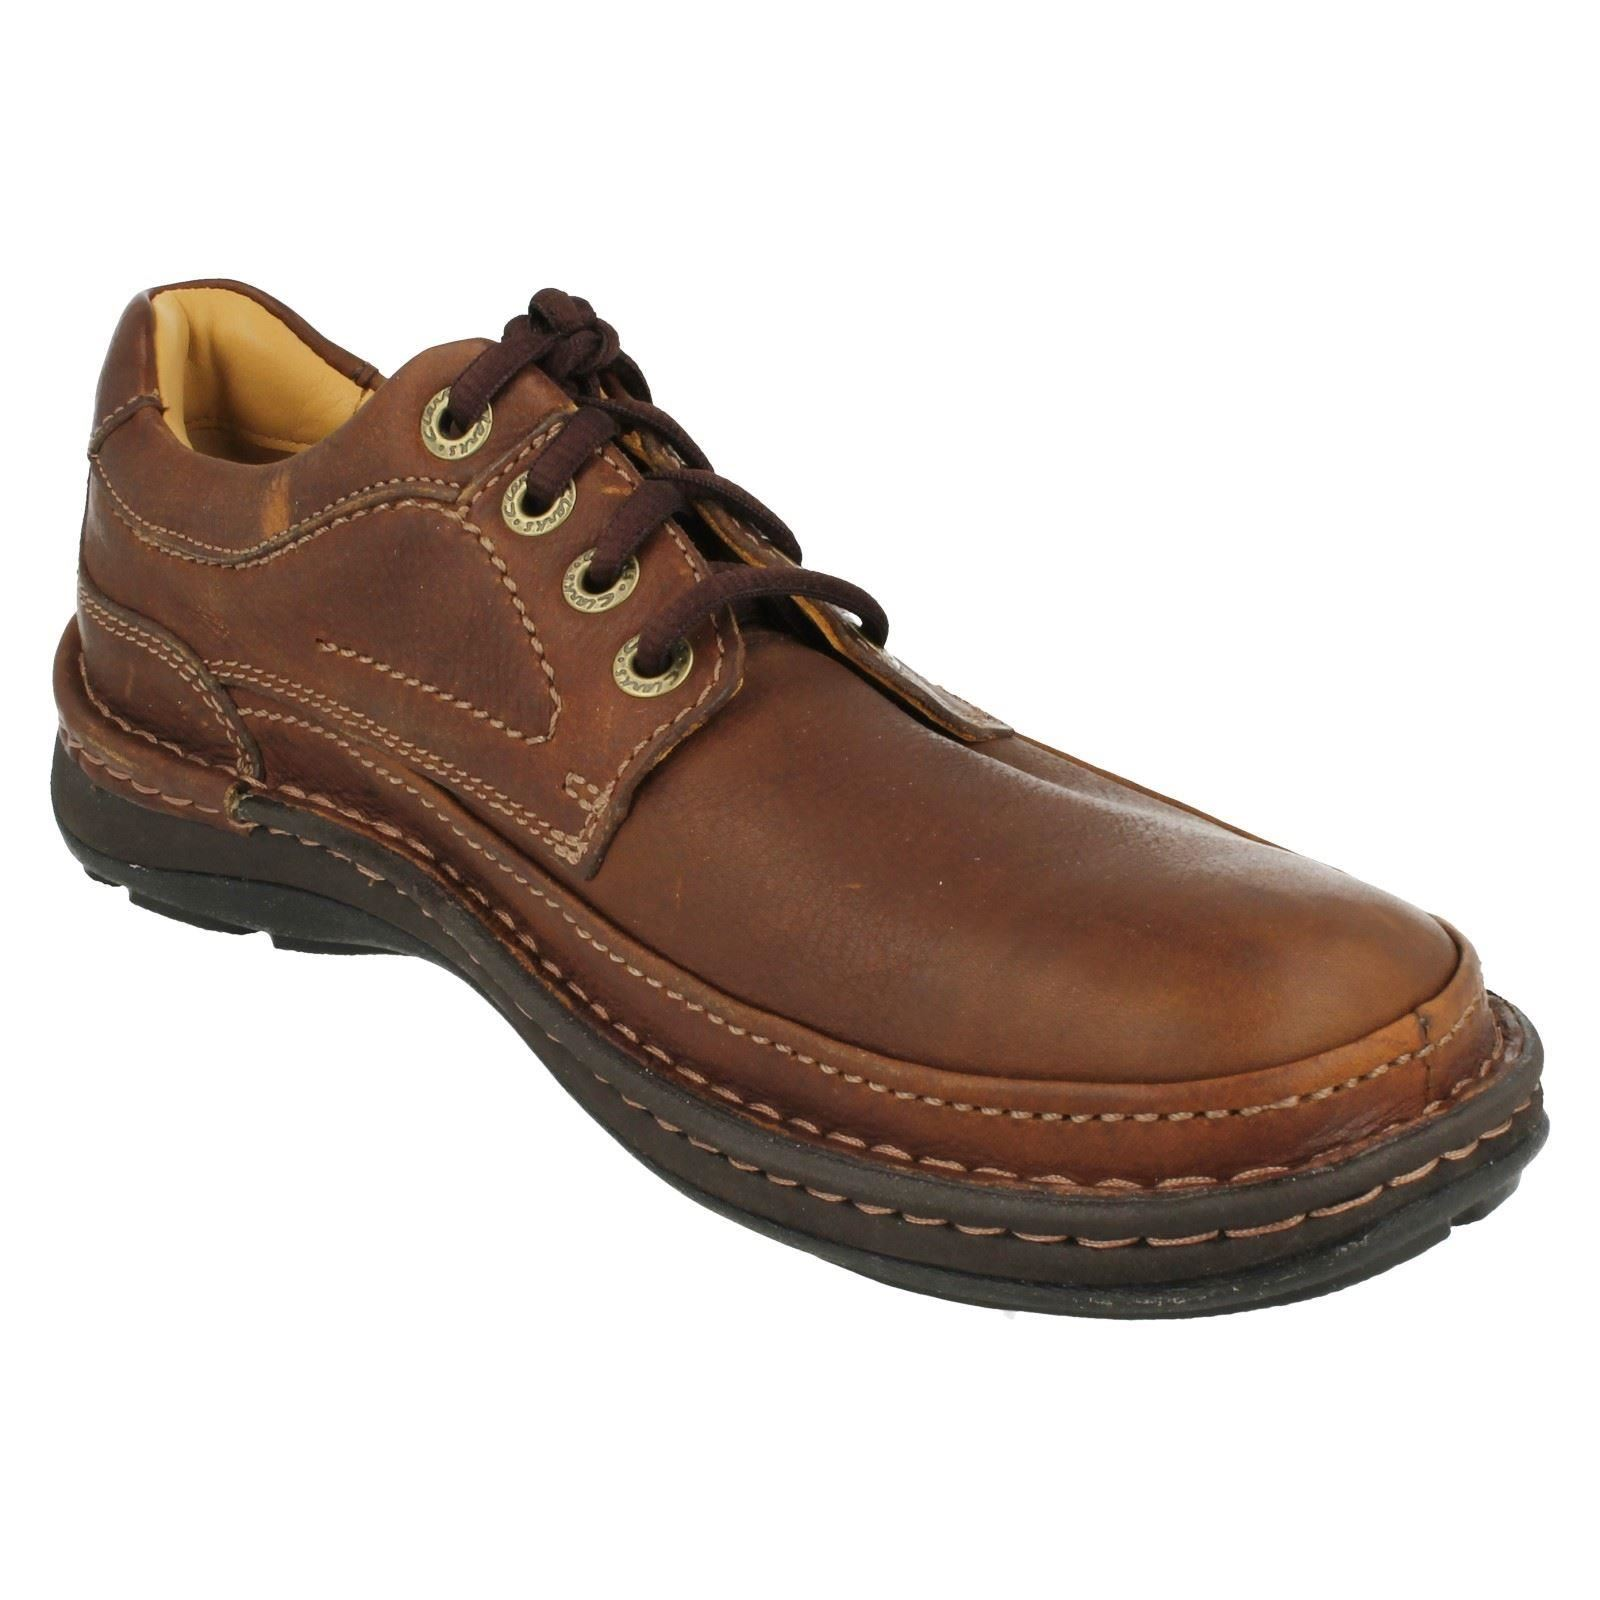 Clarks Active Air Shoes Size